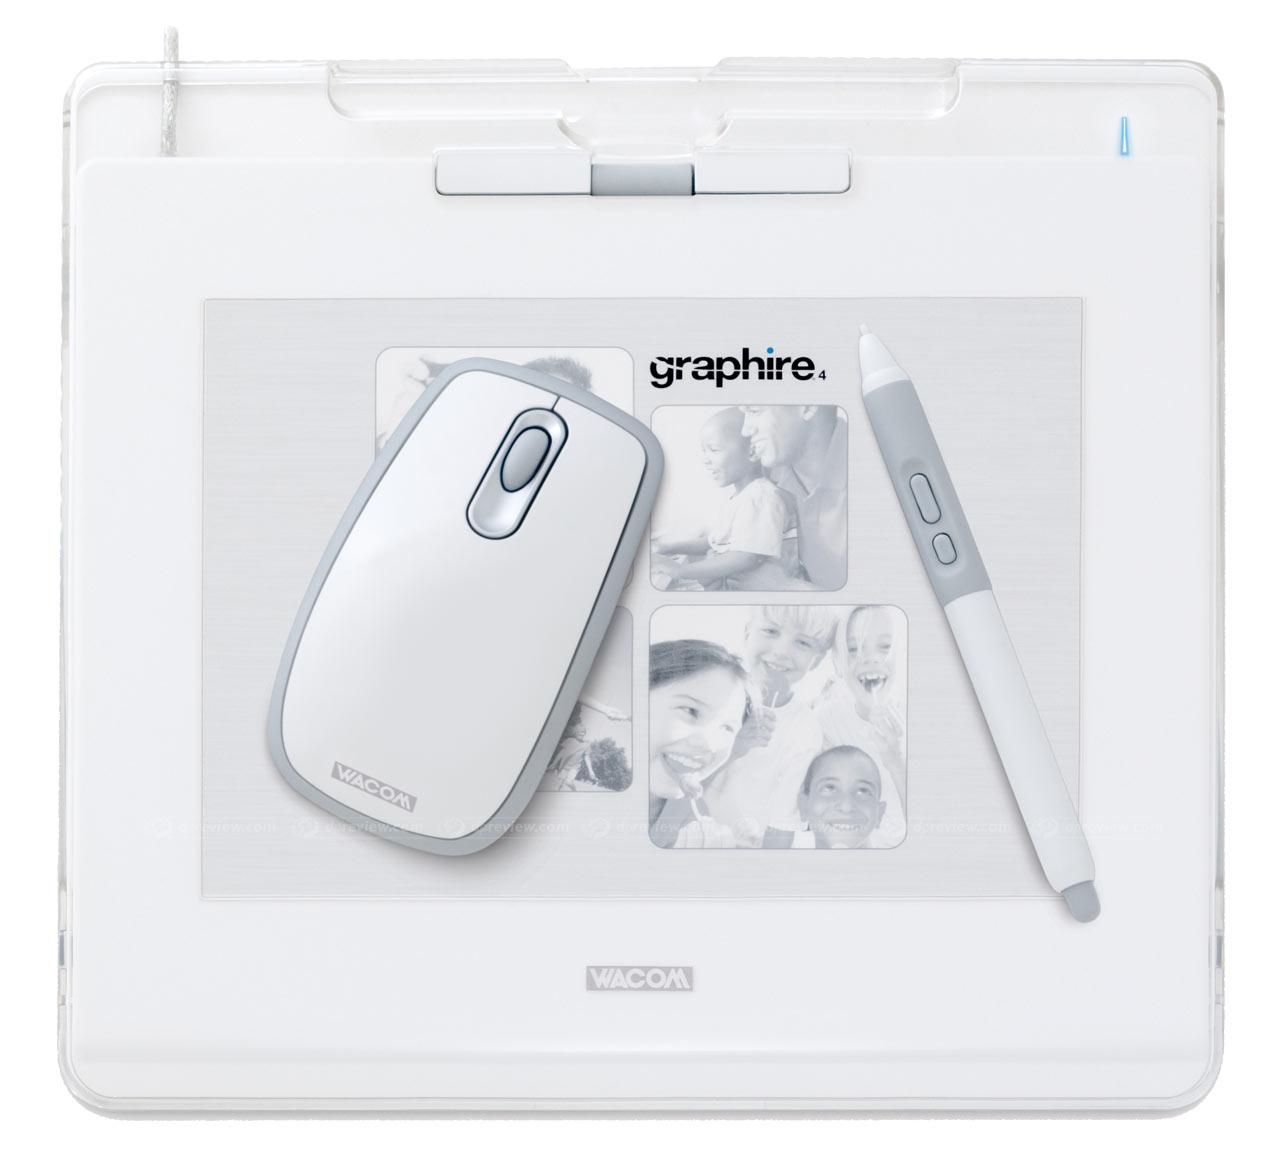 Wacom Graphire4 pen tablets: Digital Photography Review